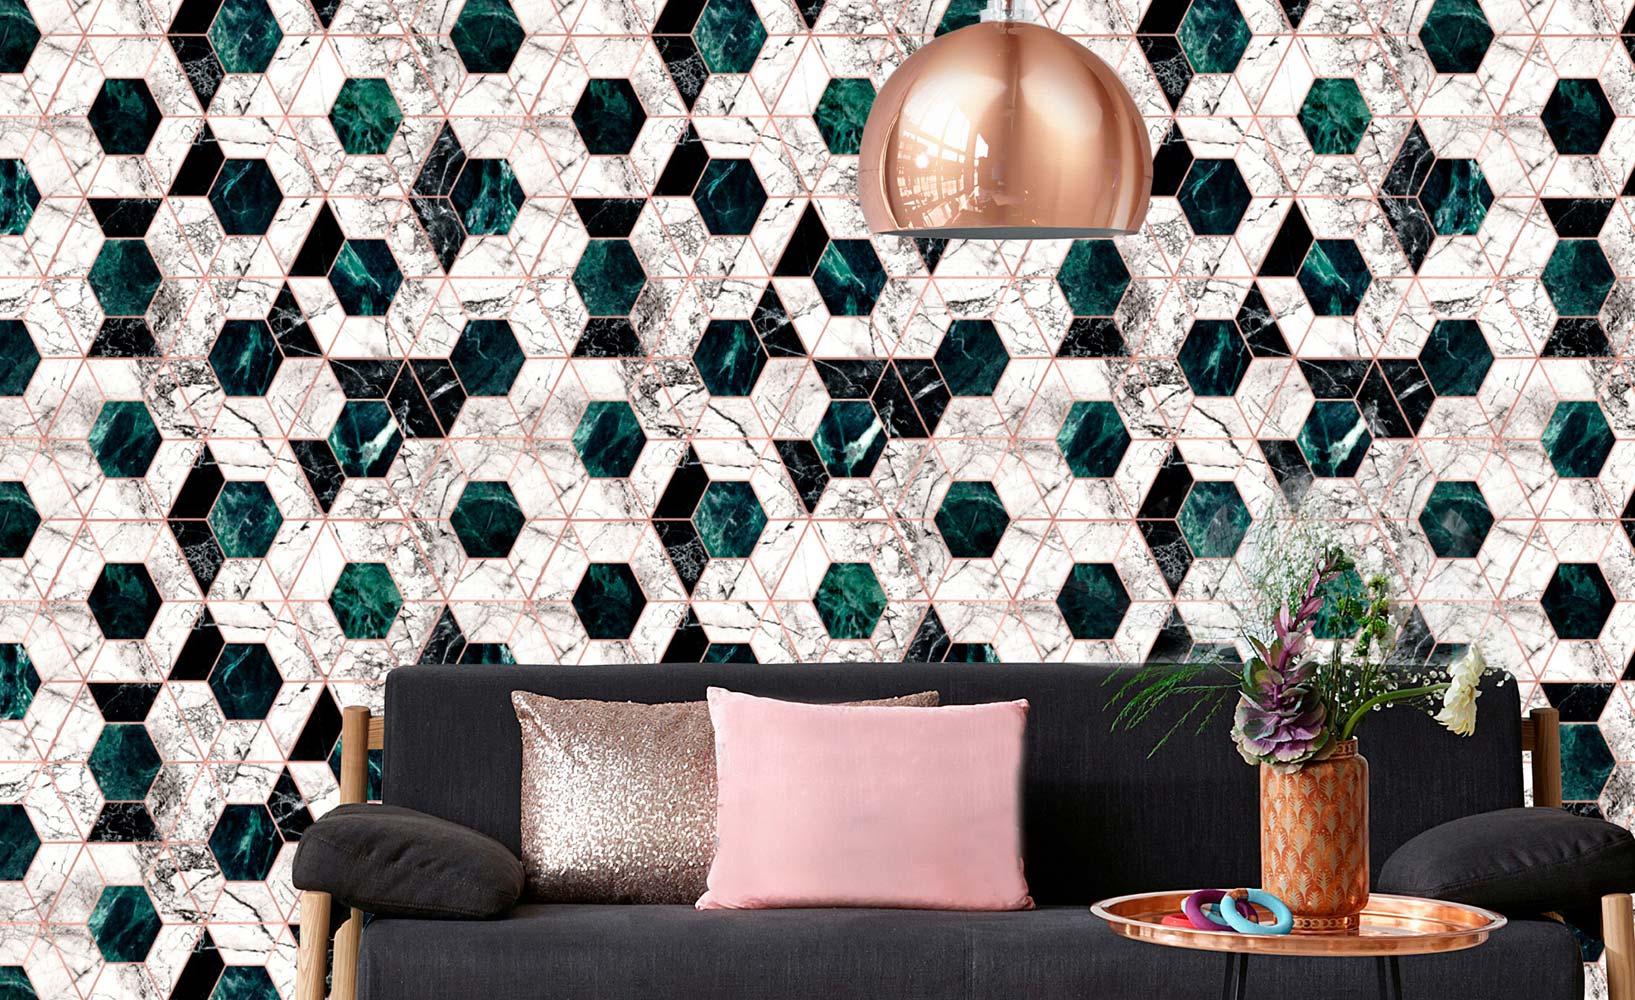 Wandgestaltung im Metallic-Look